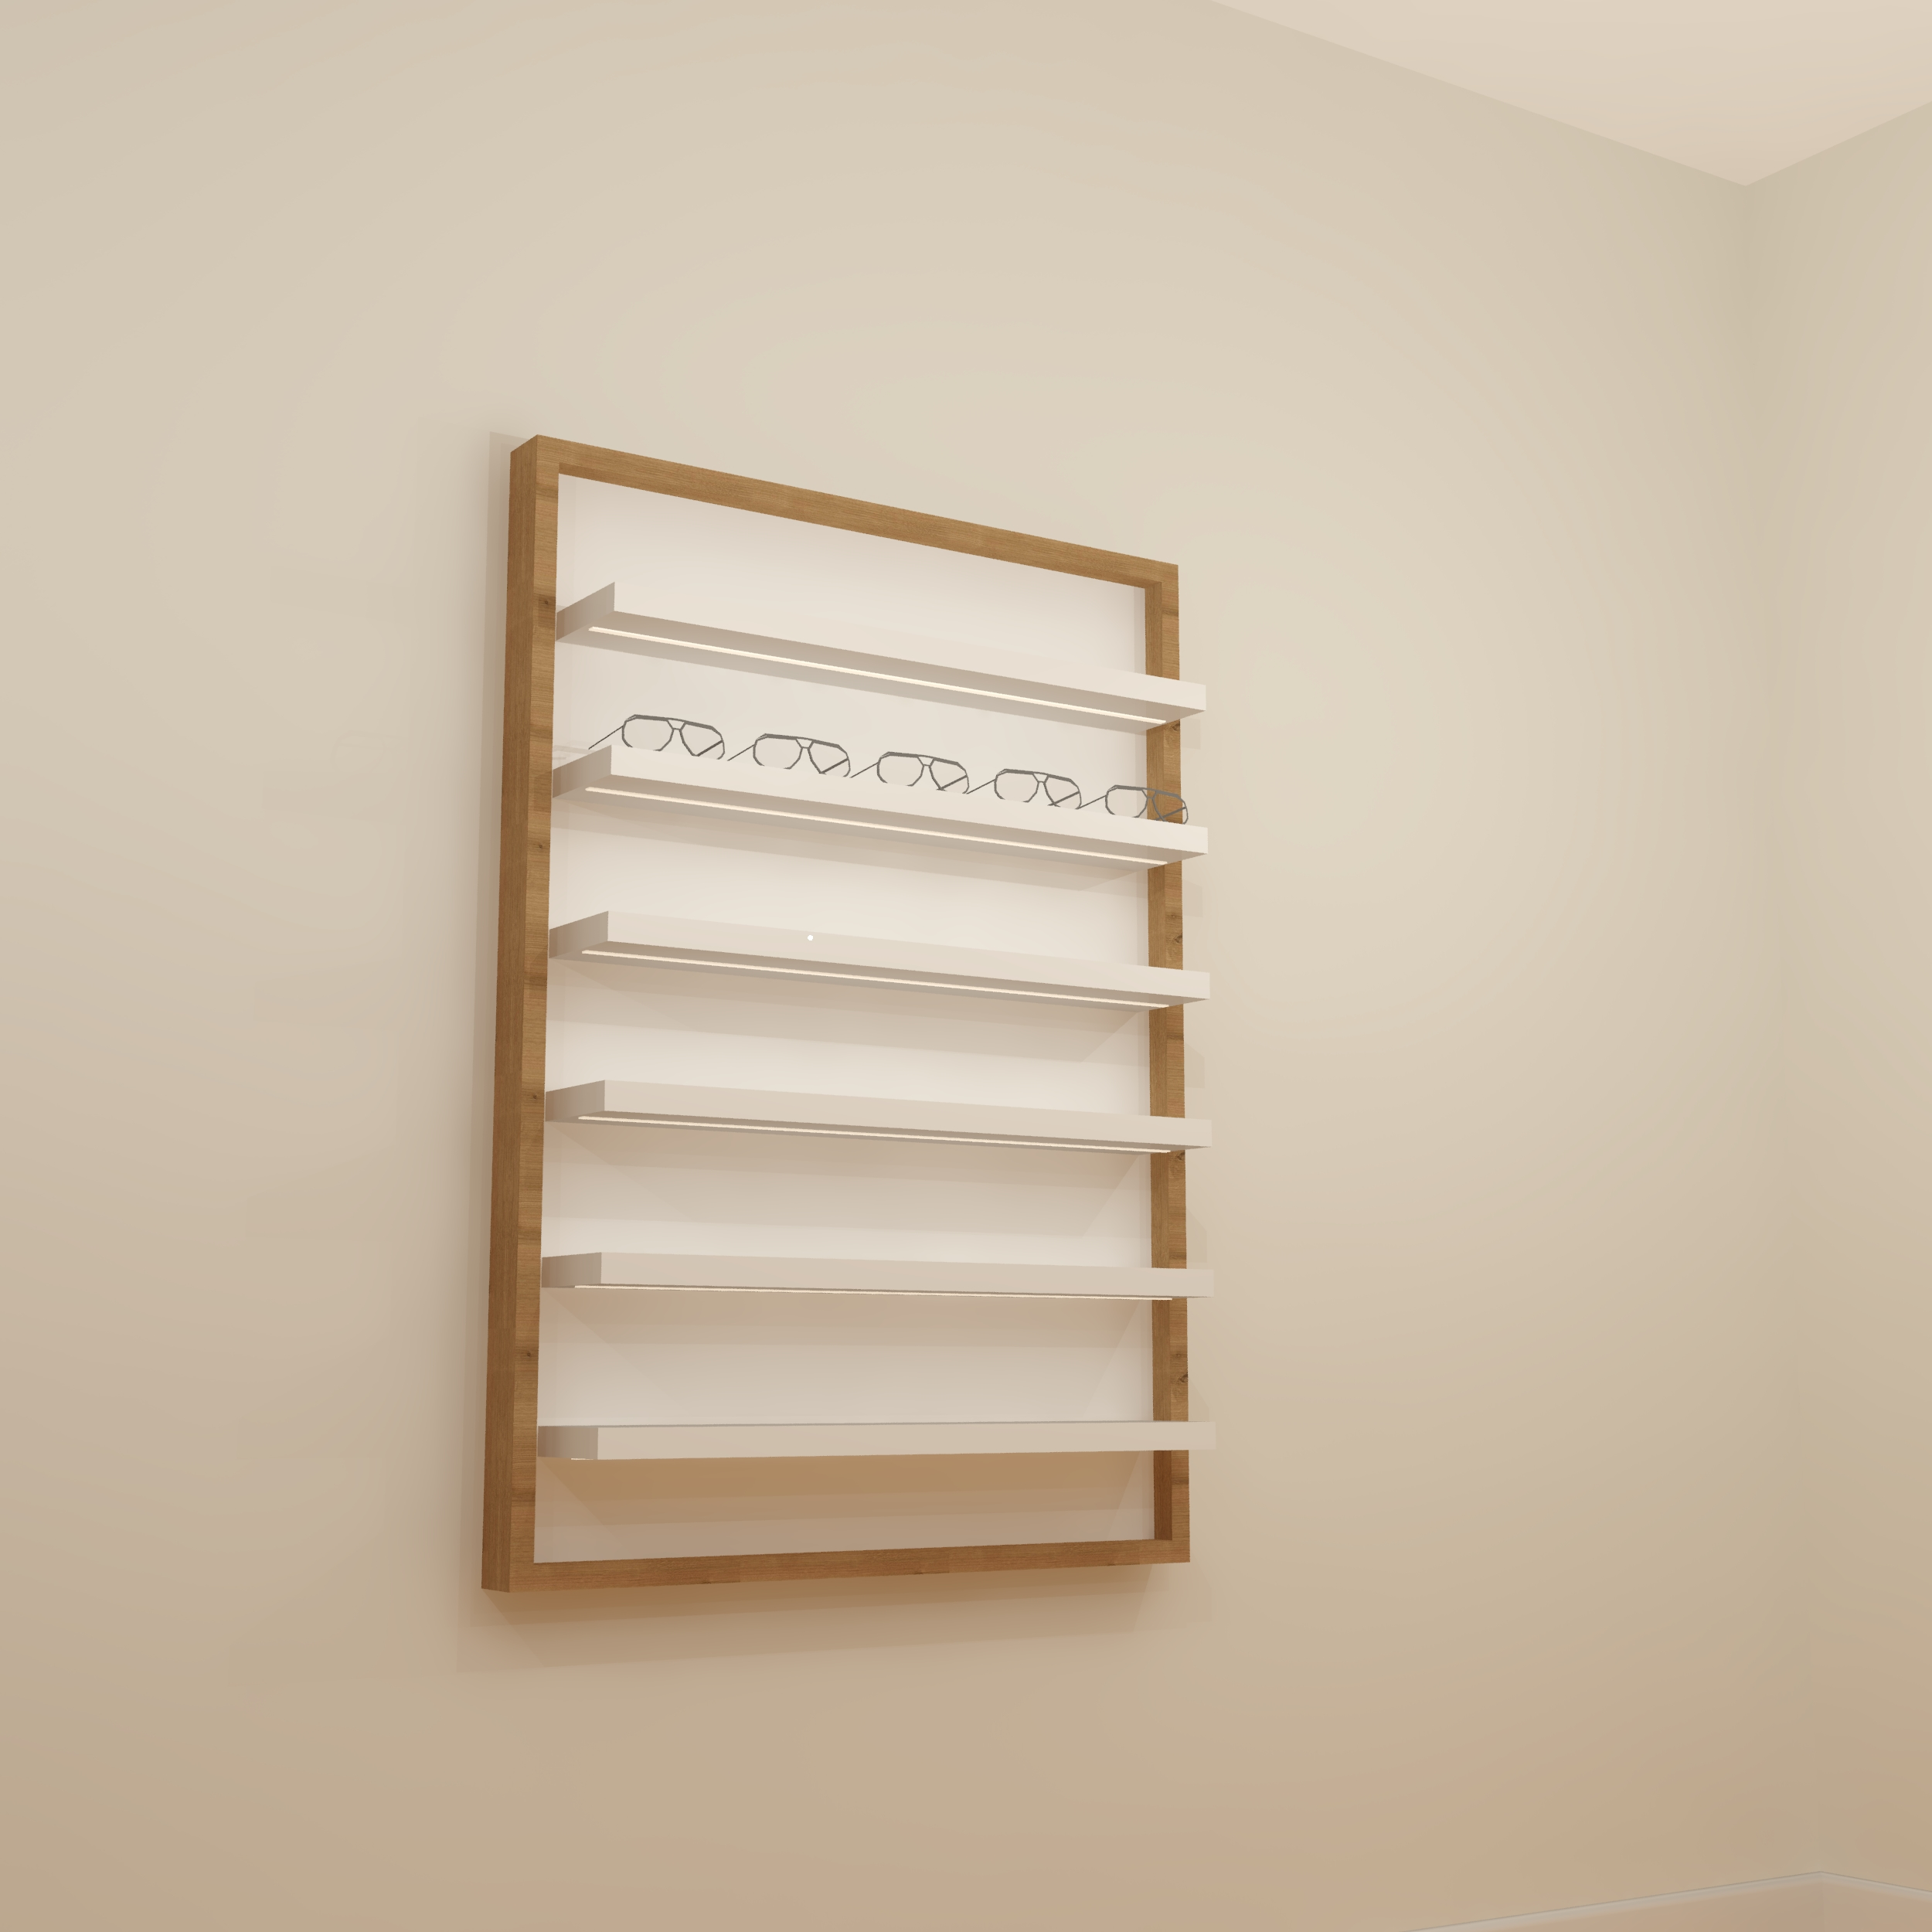 Lola LED Shelf Display 10/14